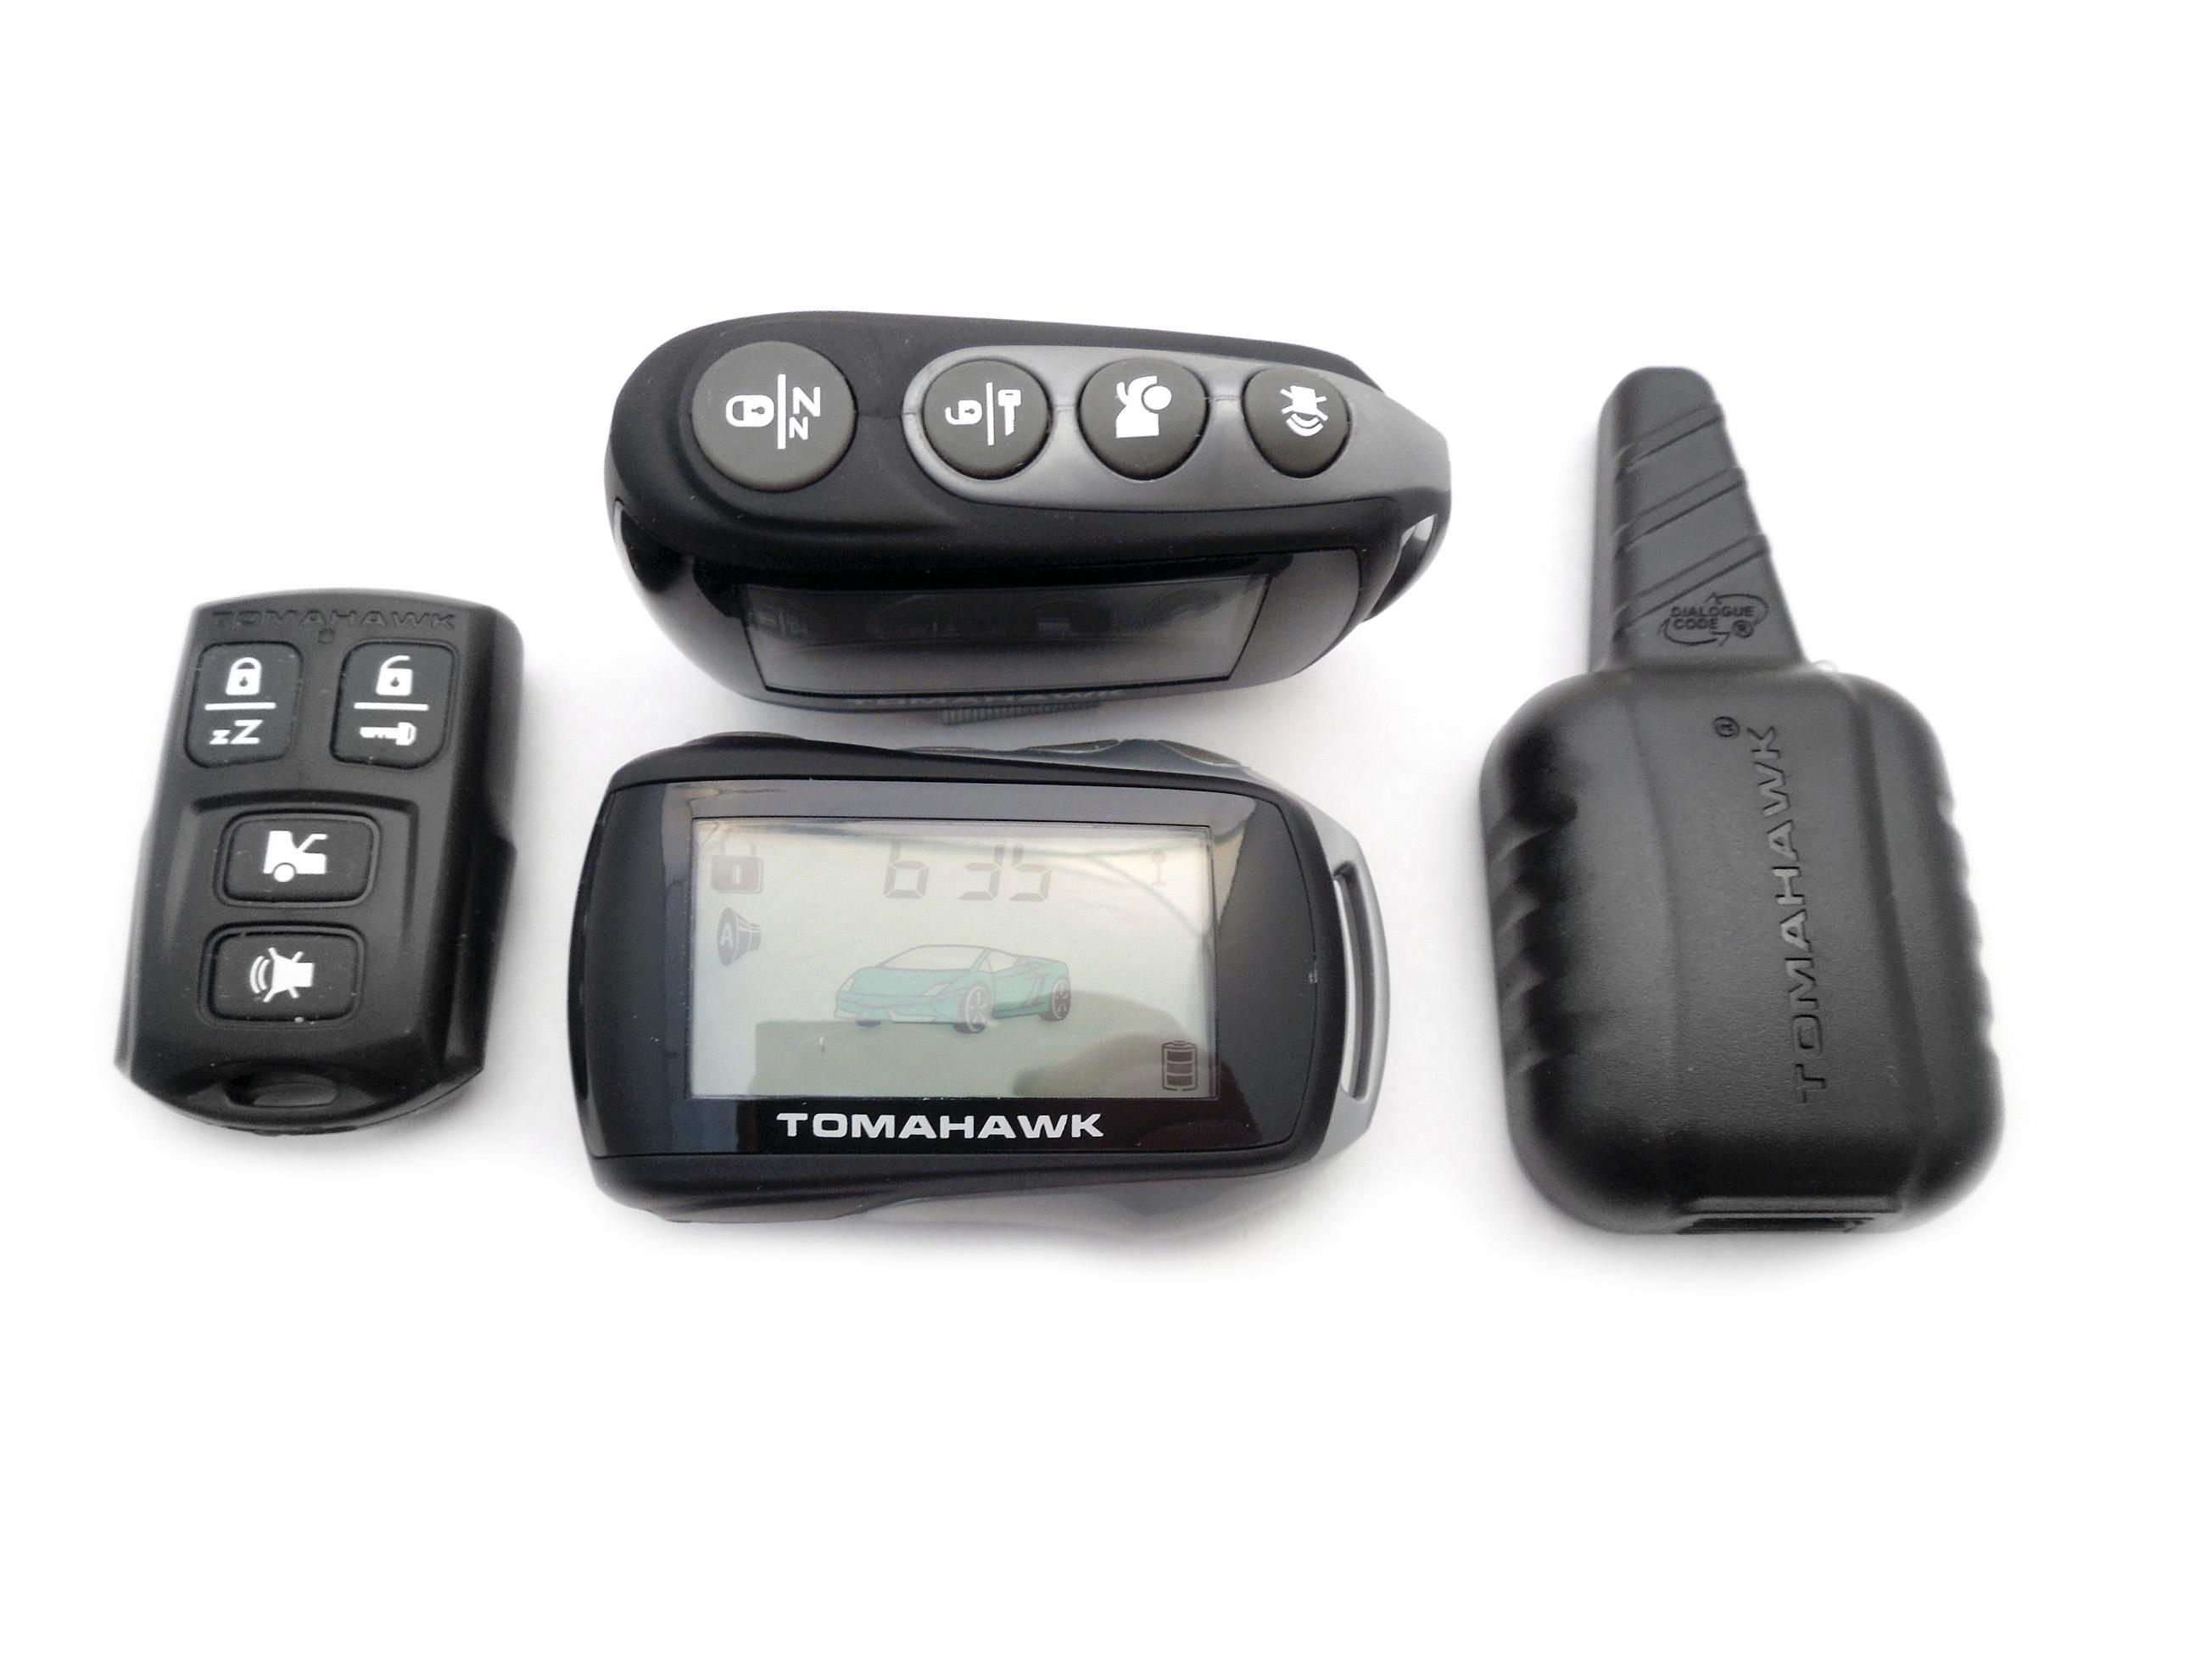 Tomahawk G-9000 G-9000 CAN